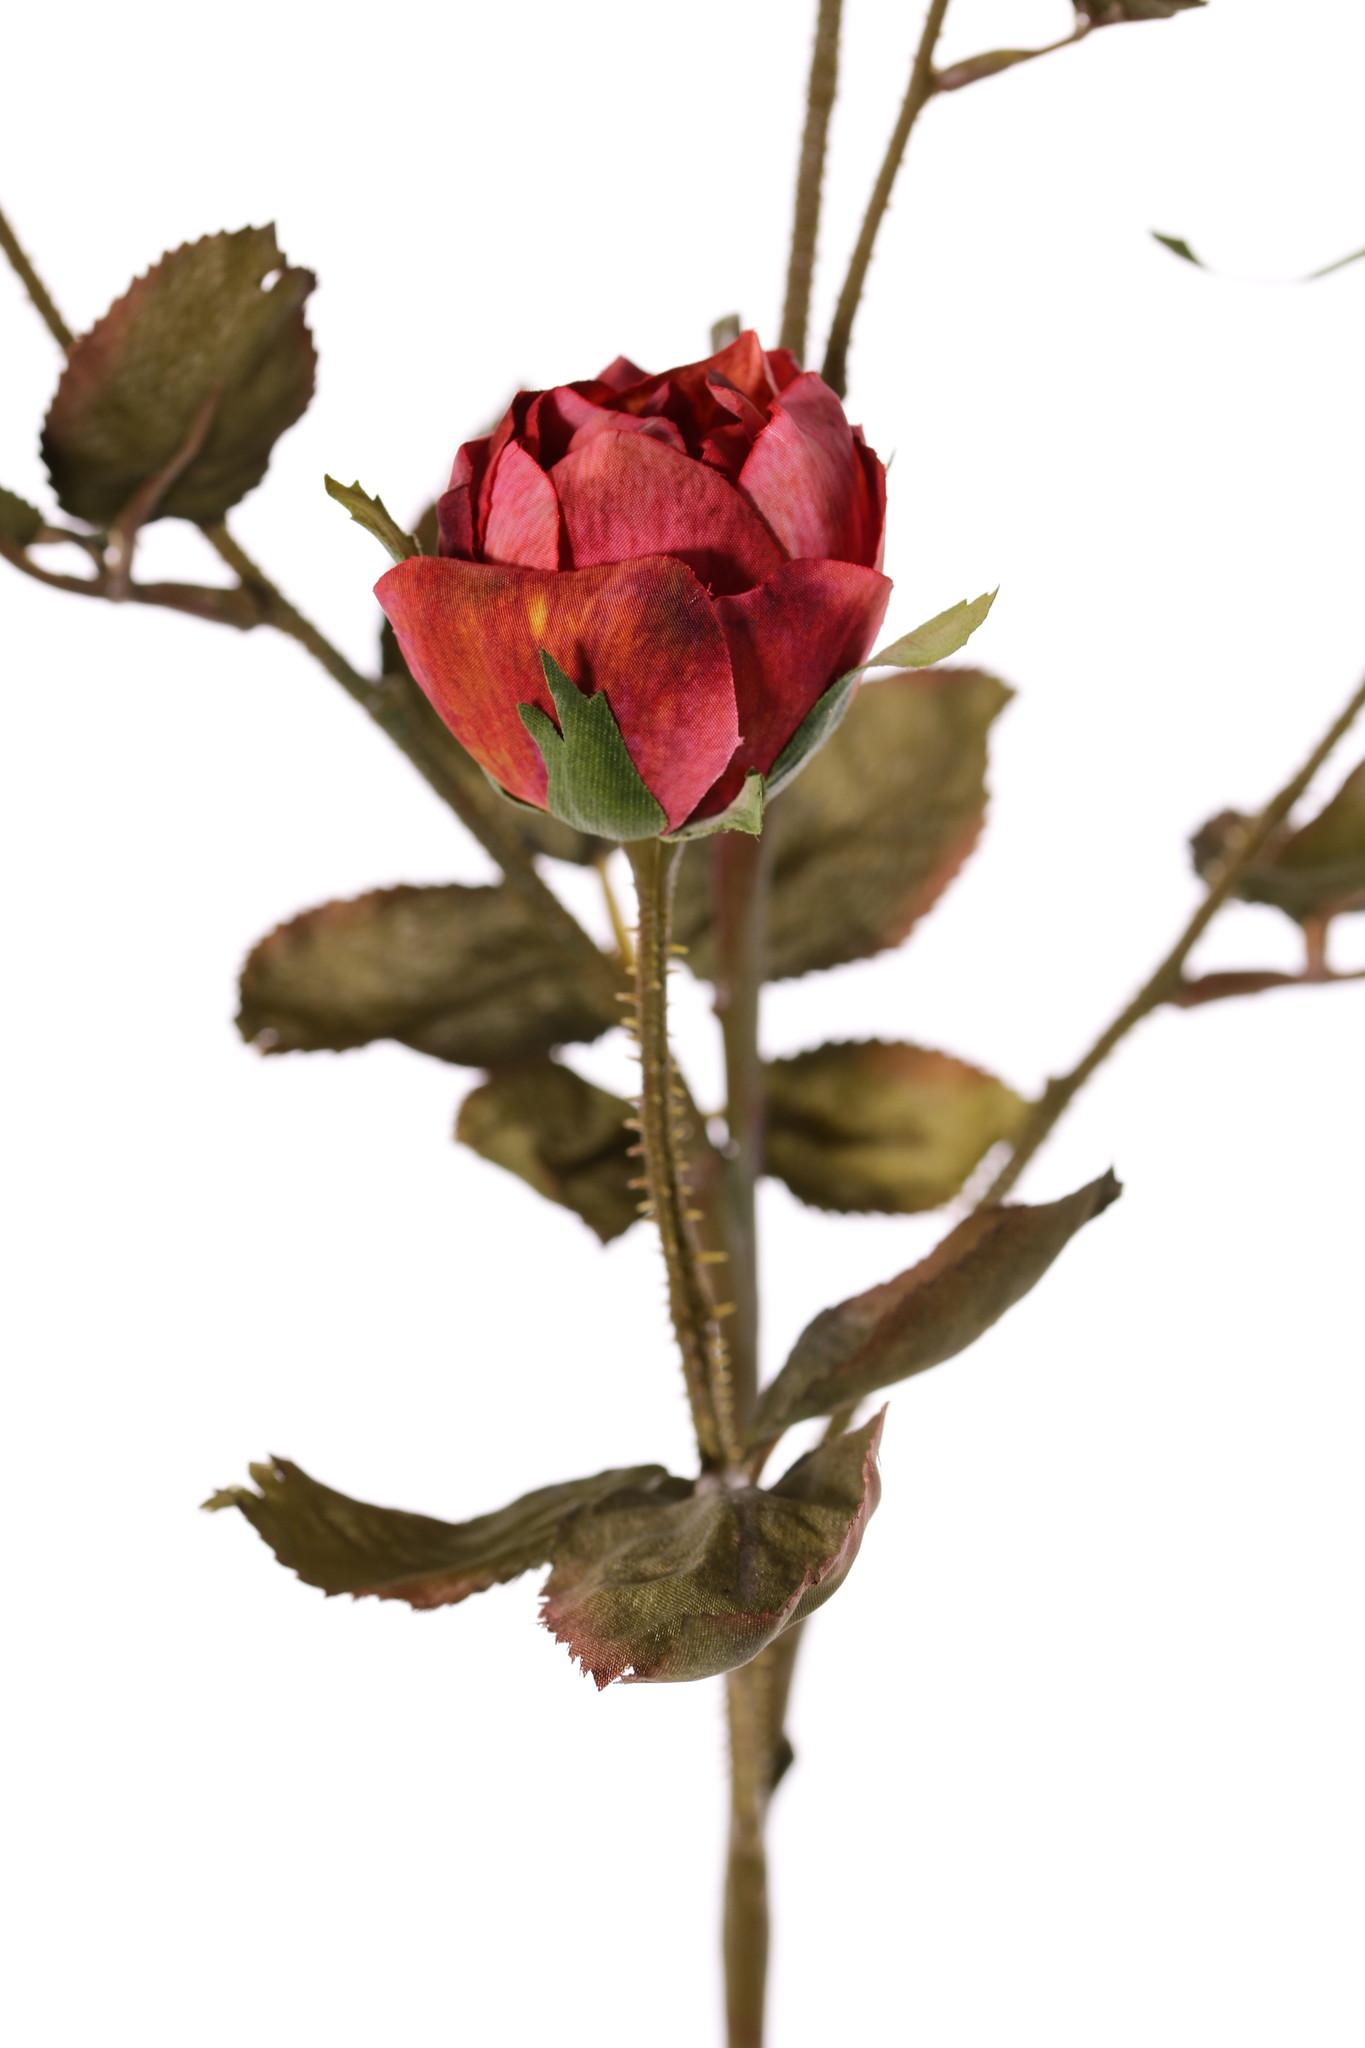 Rozentak Edith, 4 bloemen (2x Ø 8cm, 2x Ø 5cm) & 3 knop, 26 blad, 76cm